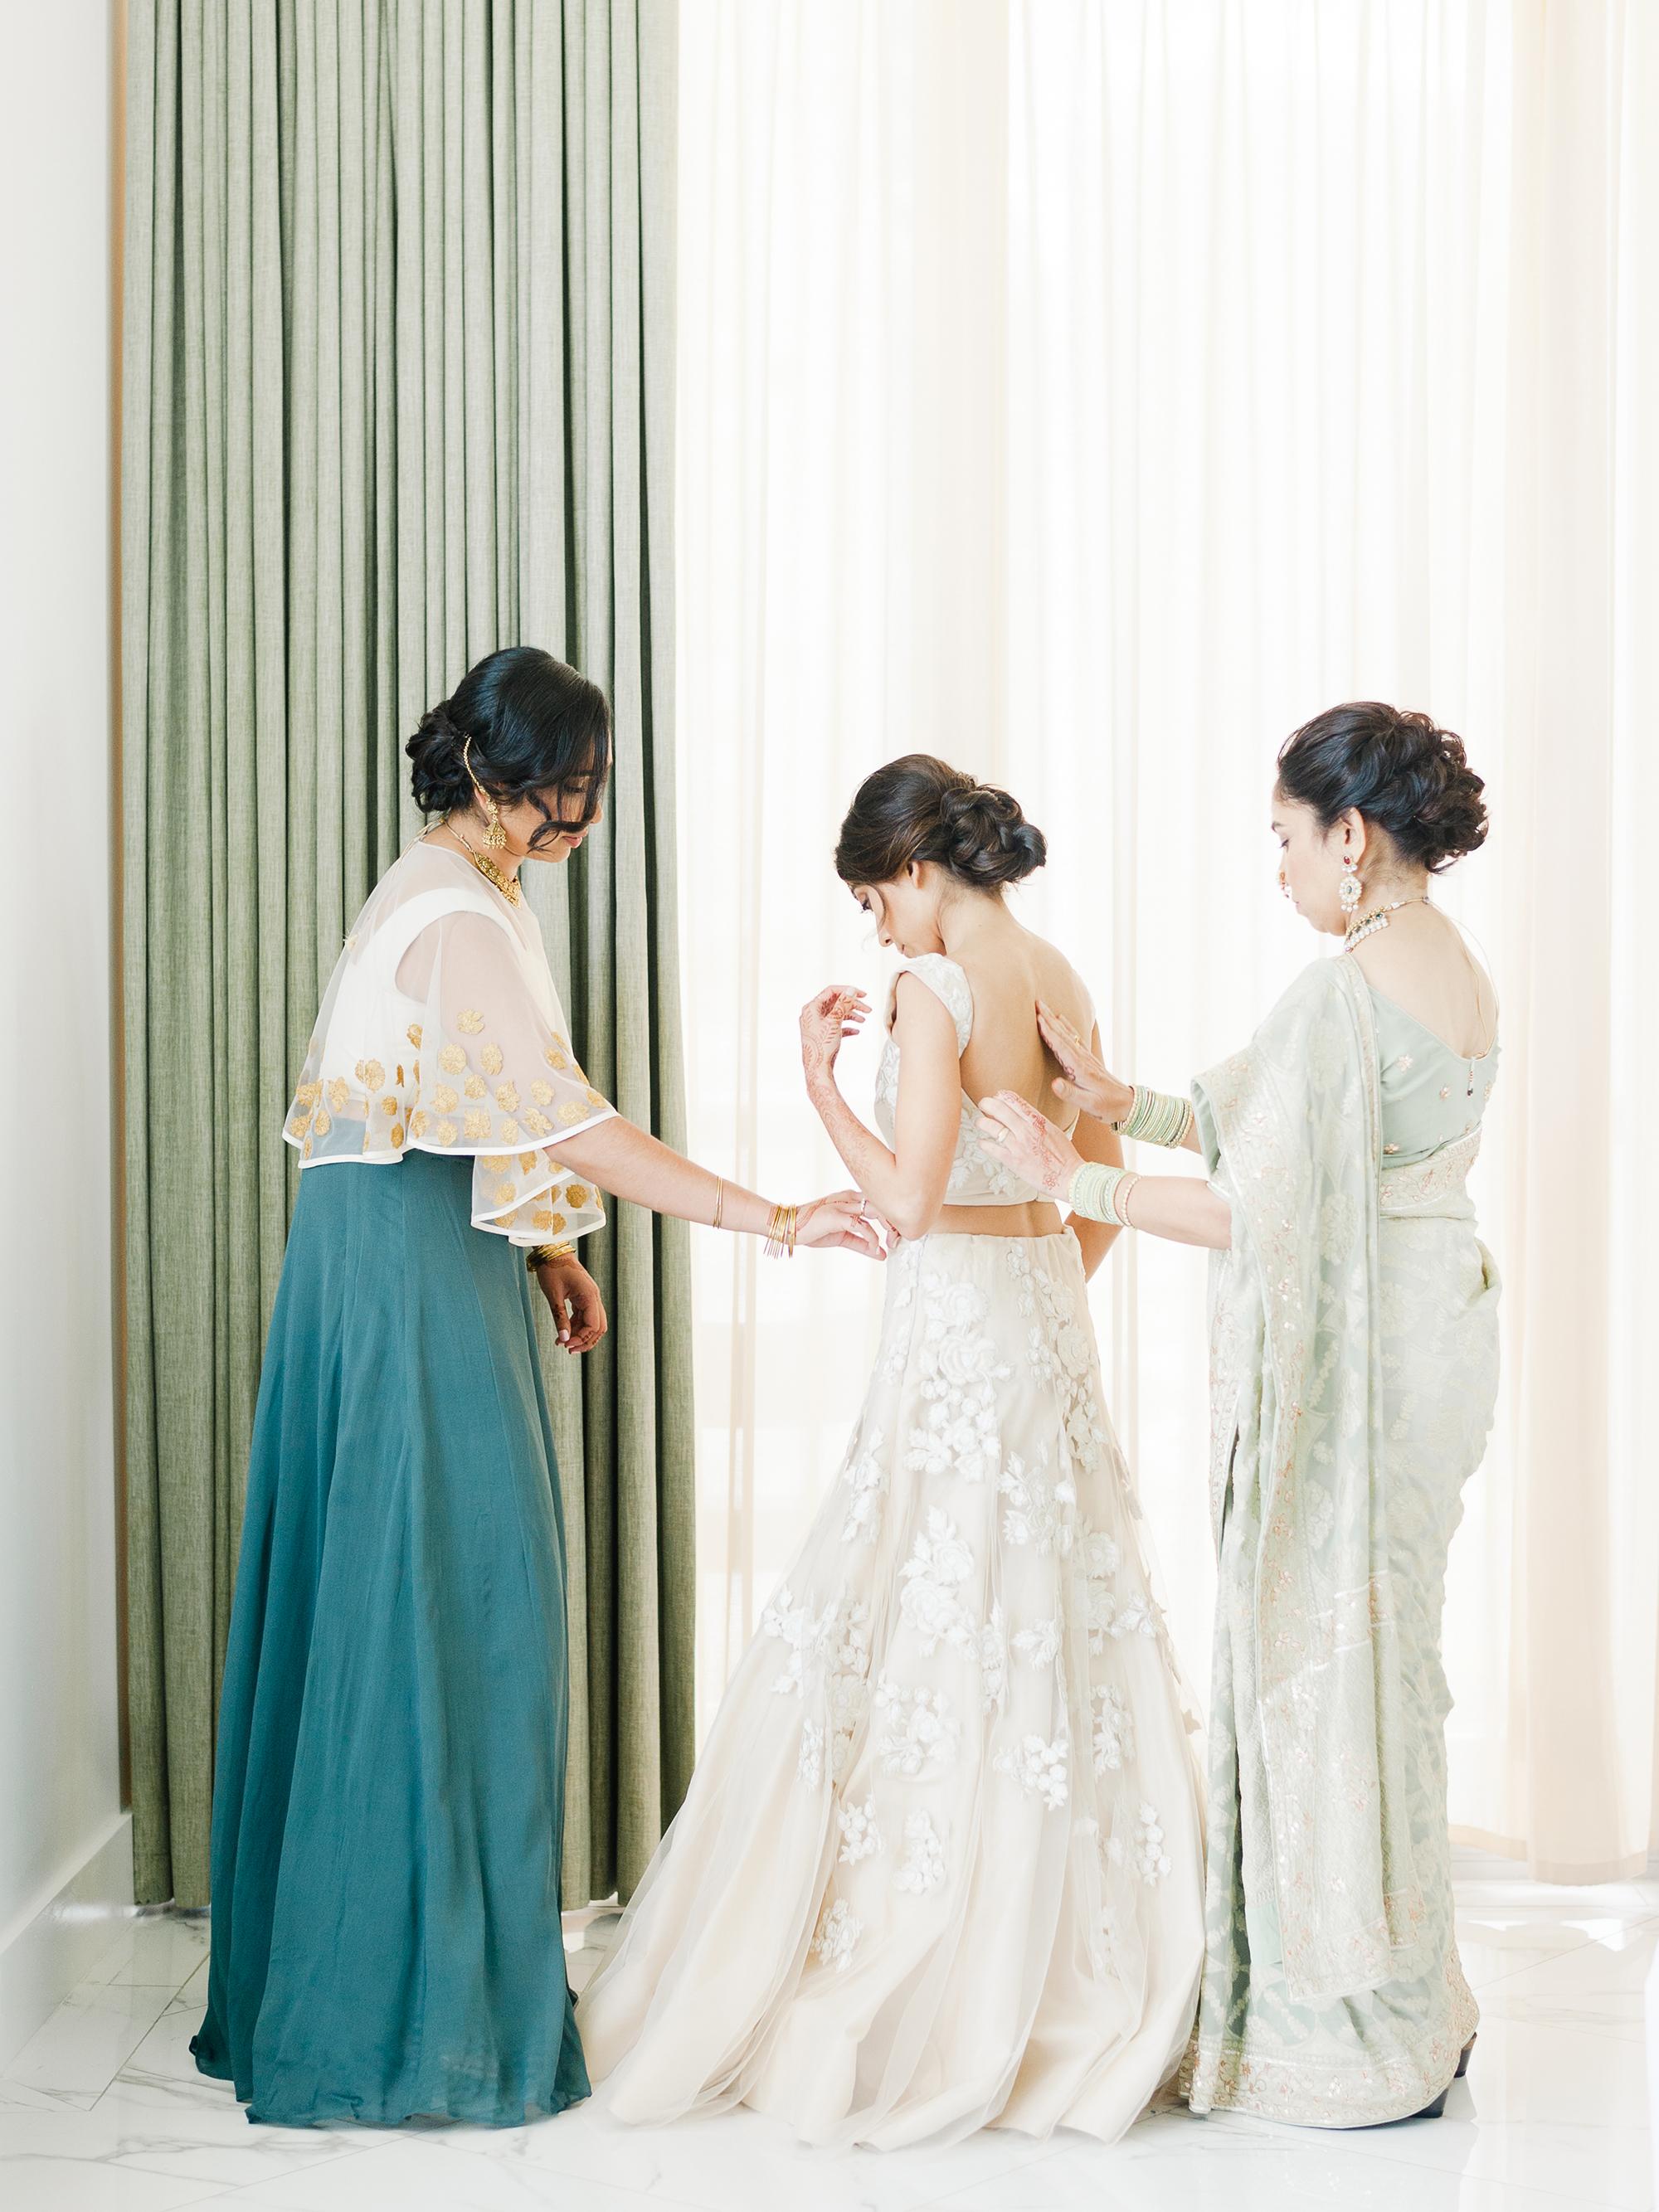 anuja nikhil wedding bride getting ready